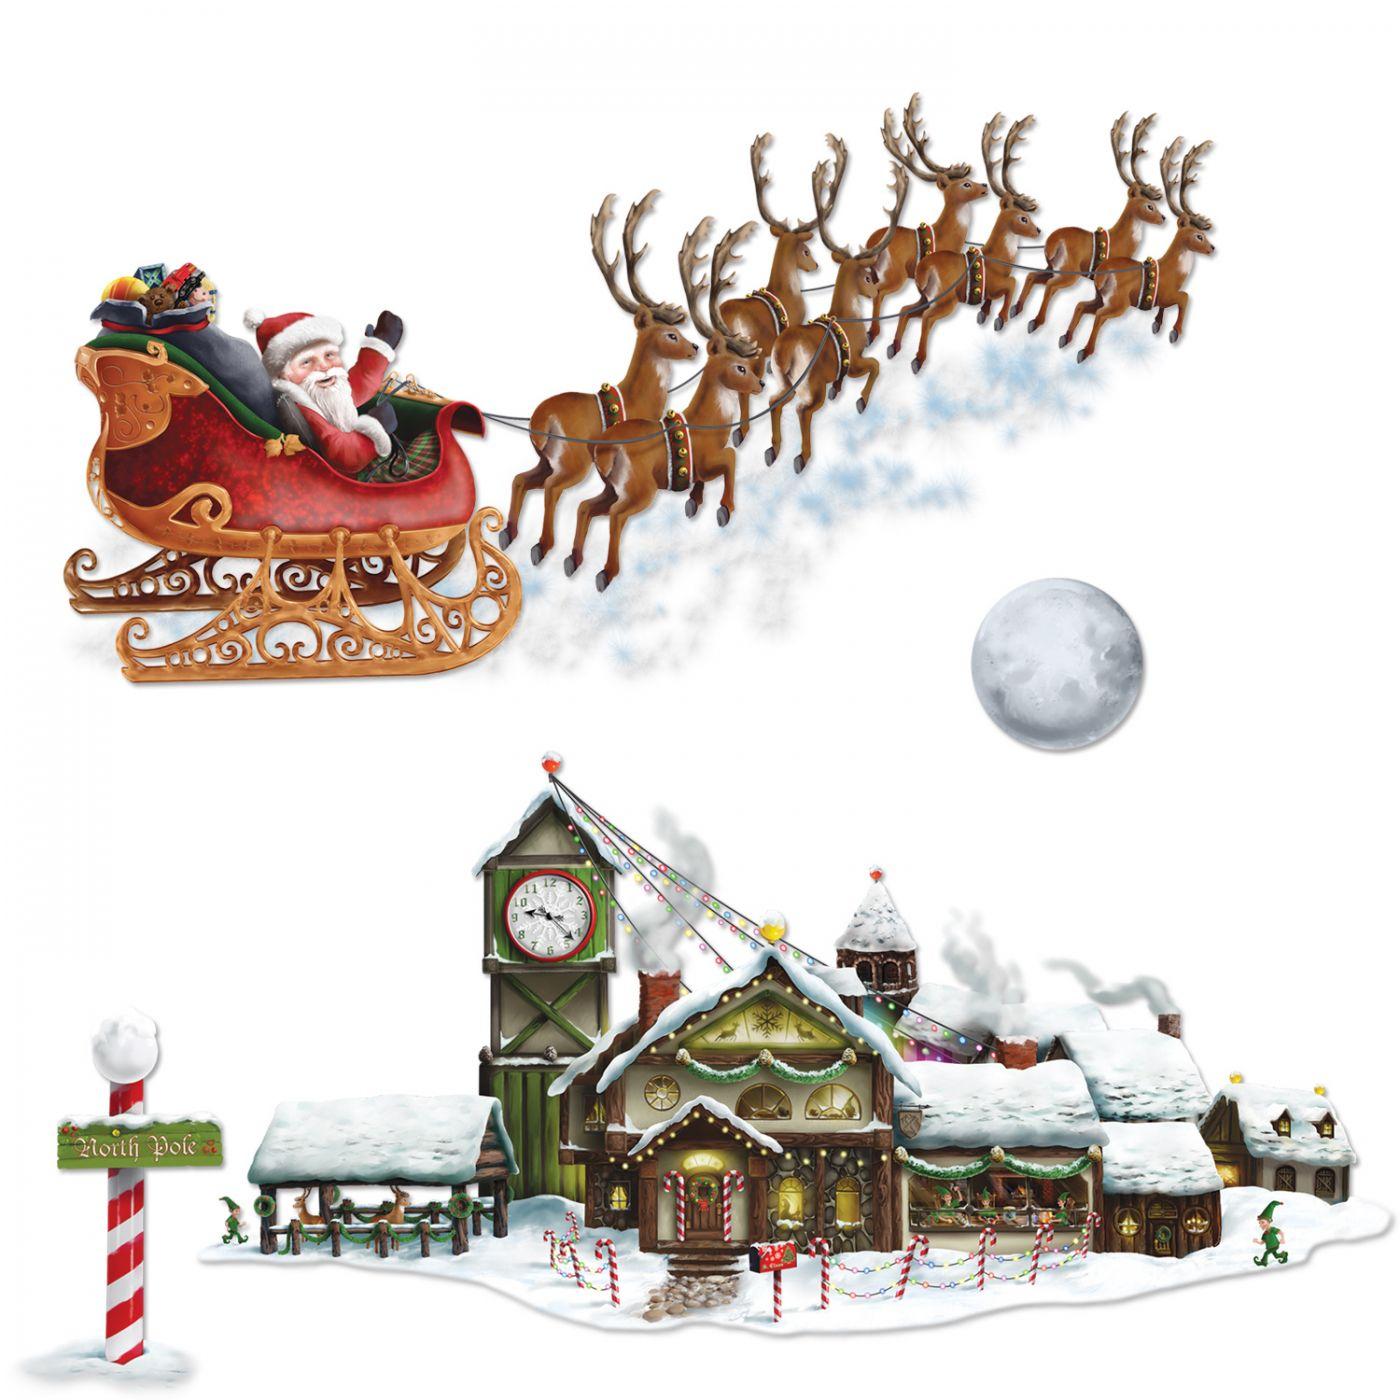 Santa's Sleigh & Workshop Props image